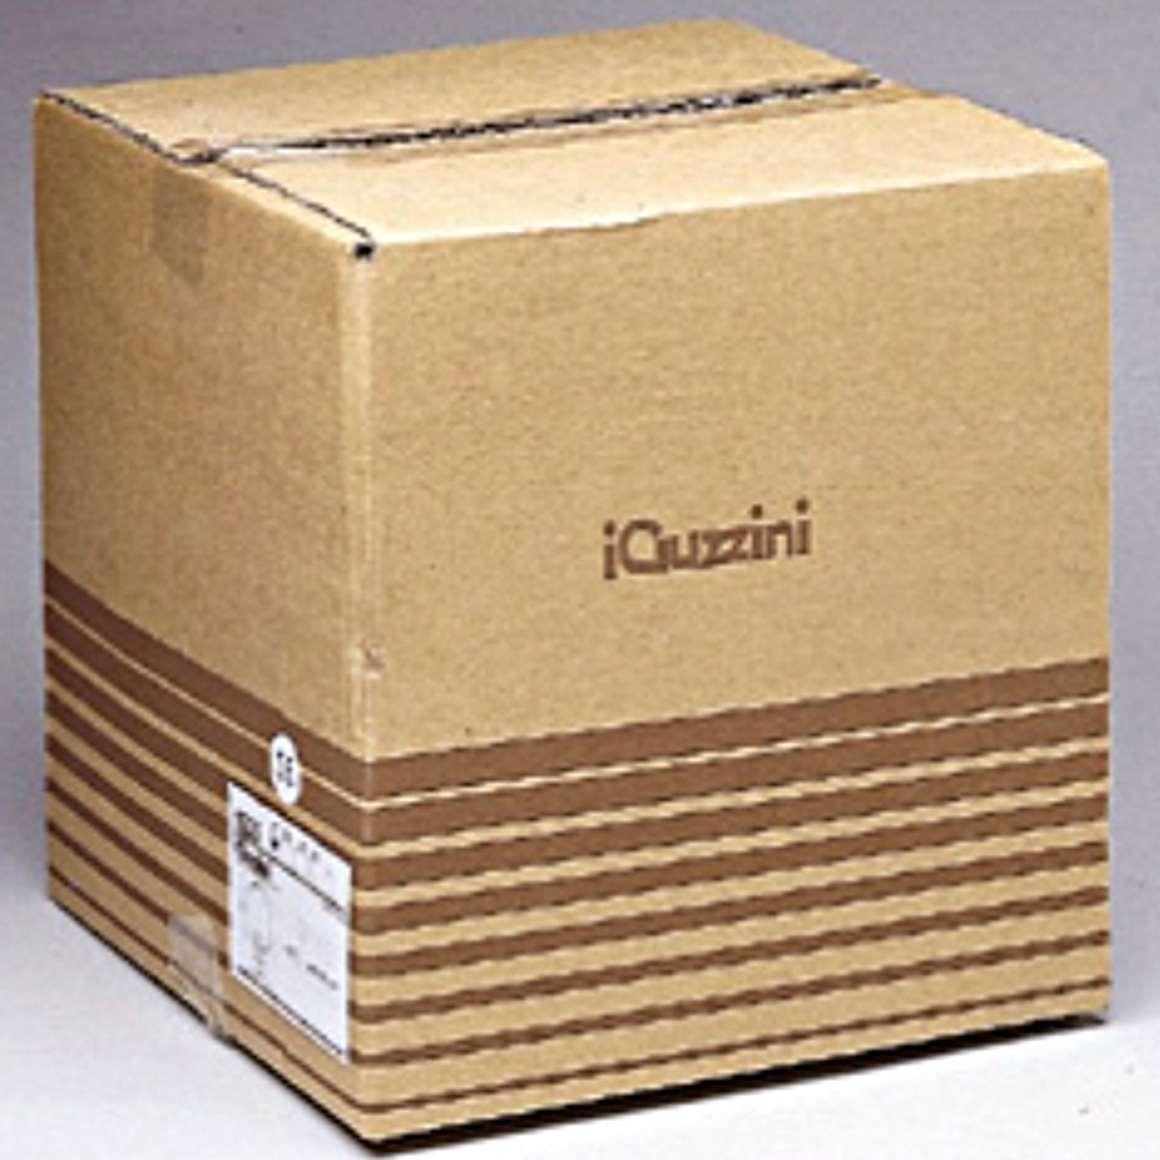 iGuzzini Bugia box